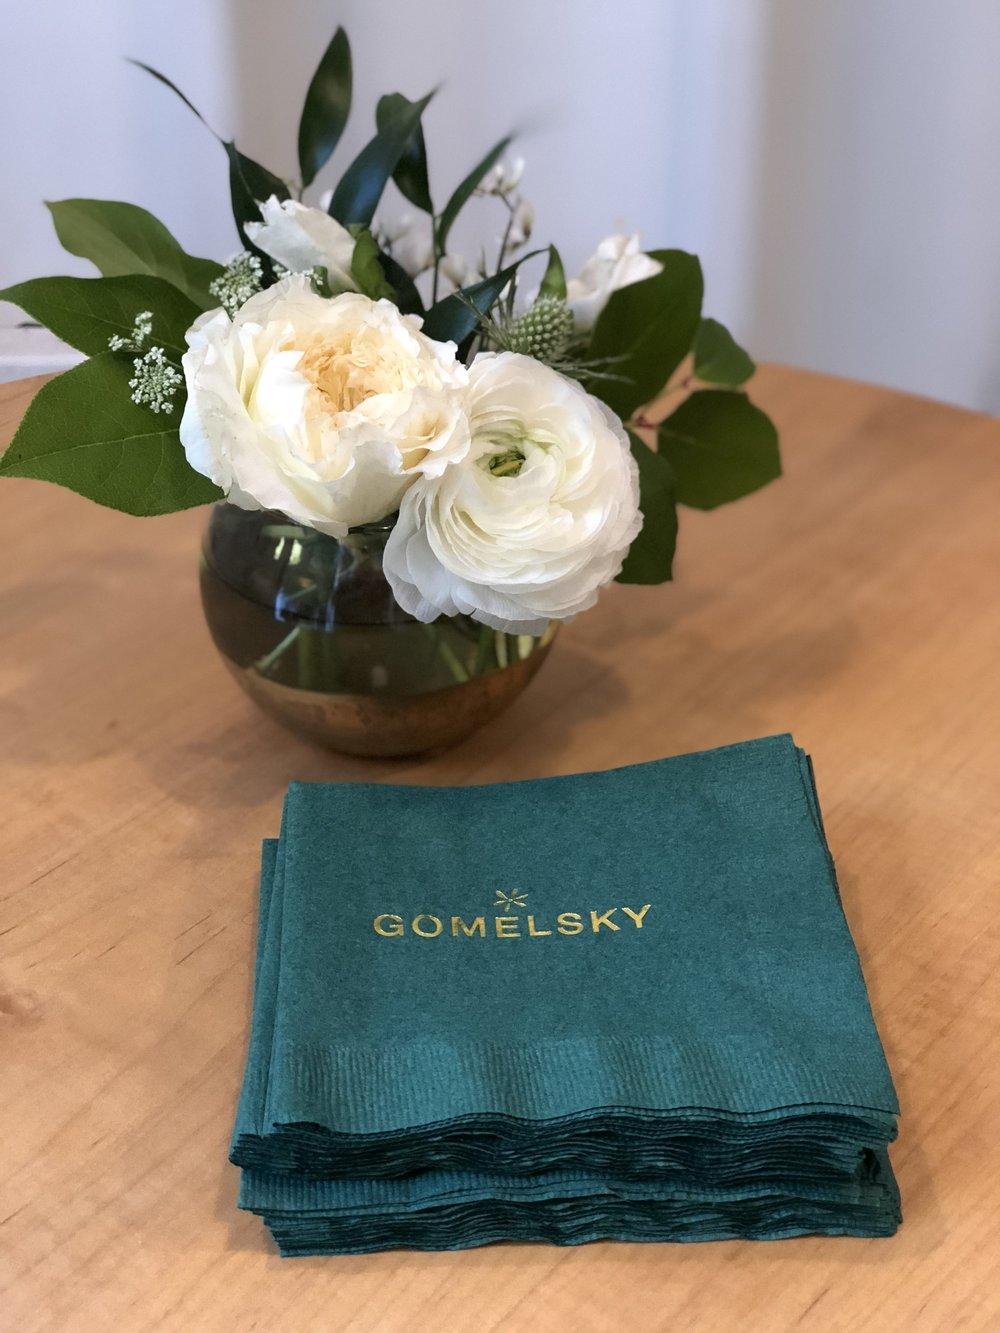 Gomelsky napkins